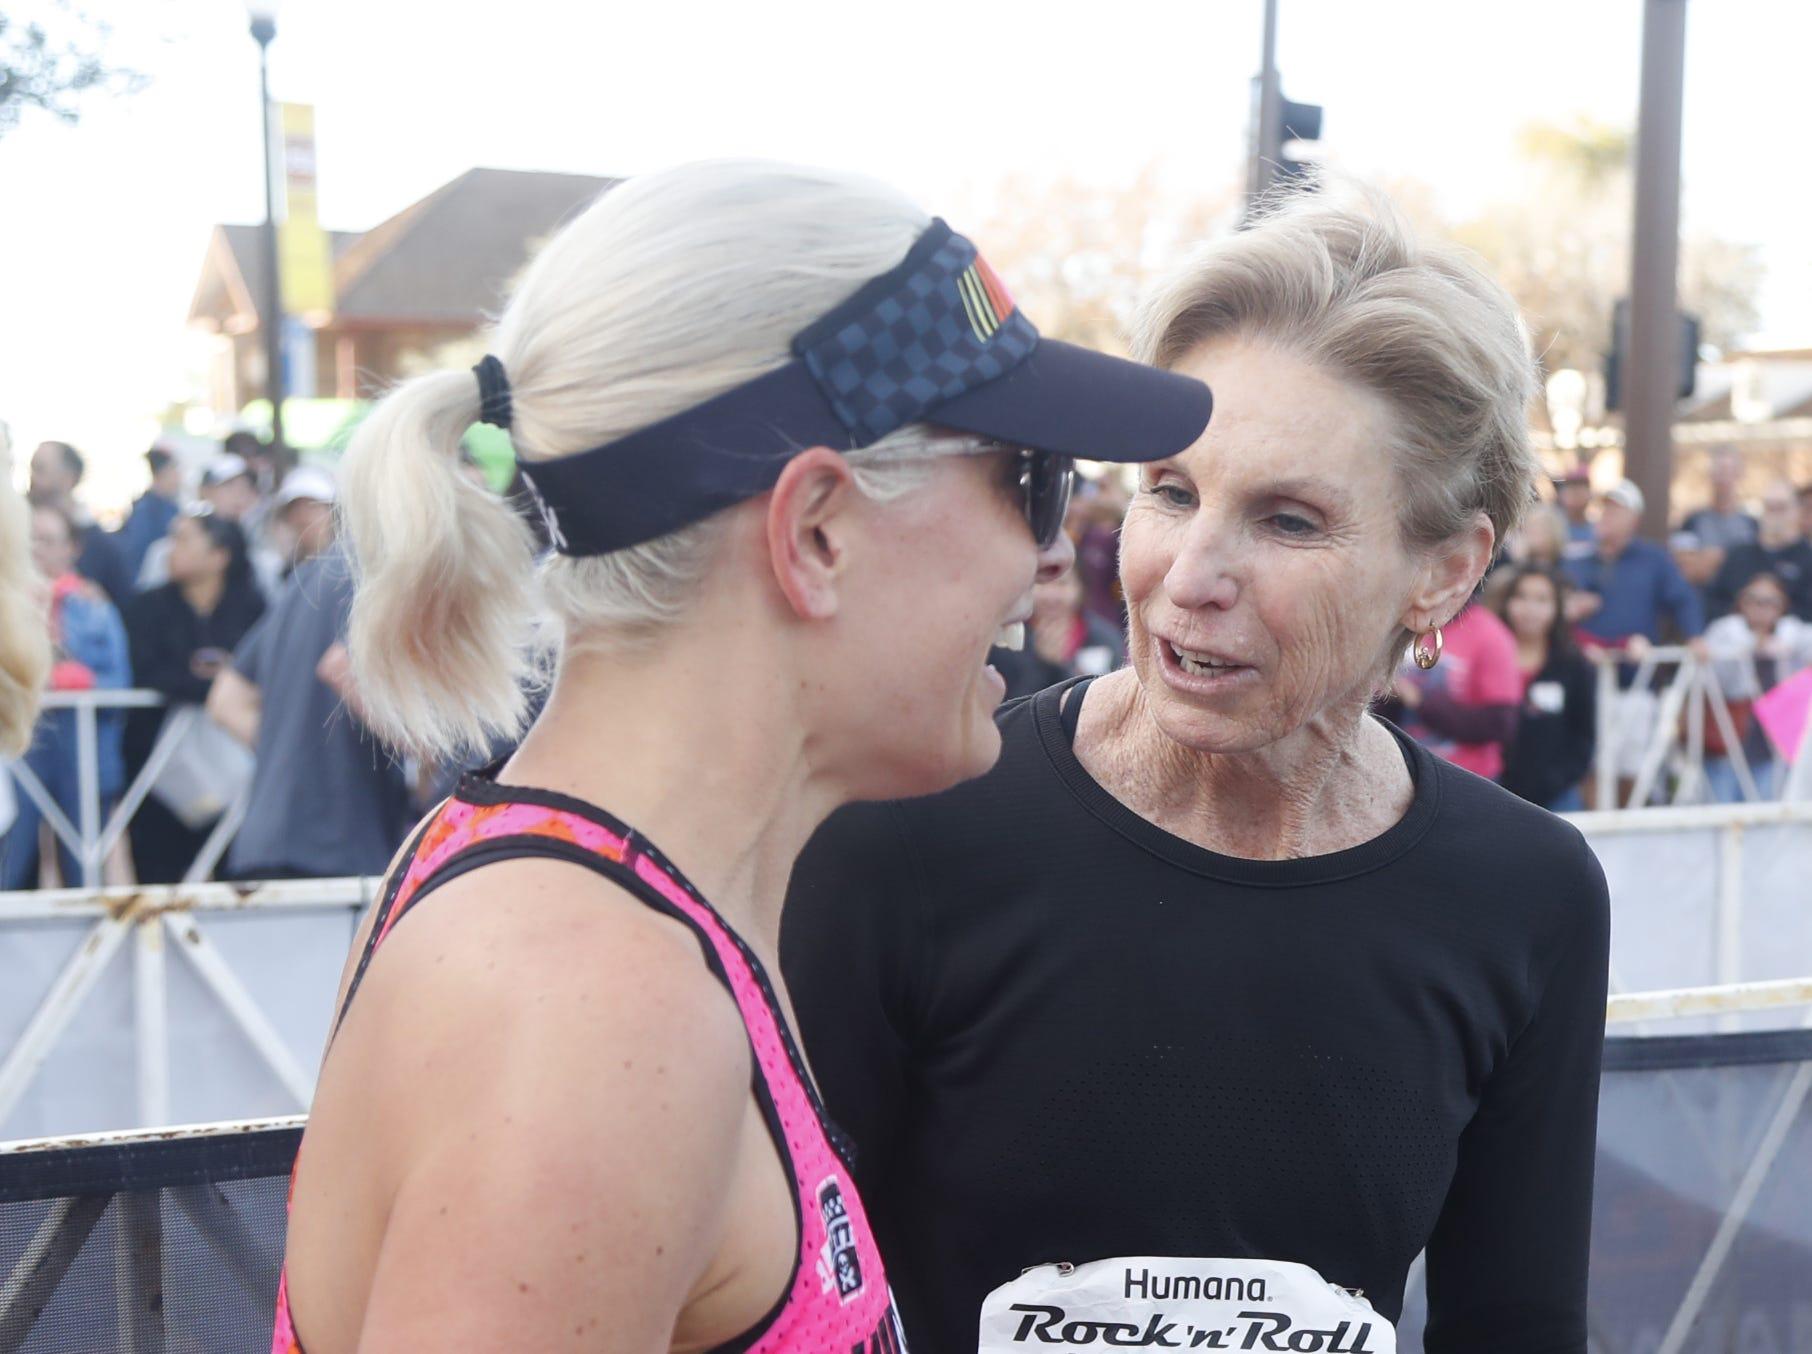 Paula Newby-Fraser (R) greets Sen. Kyrsten Sinema after Sinema finished the Rock 'n' Roll half-marathon in Tempe on Jan. 20, 2019.